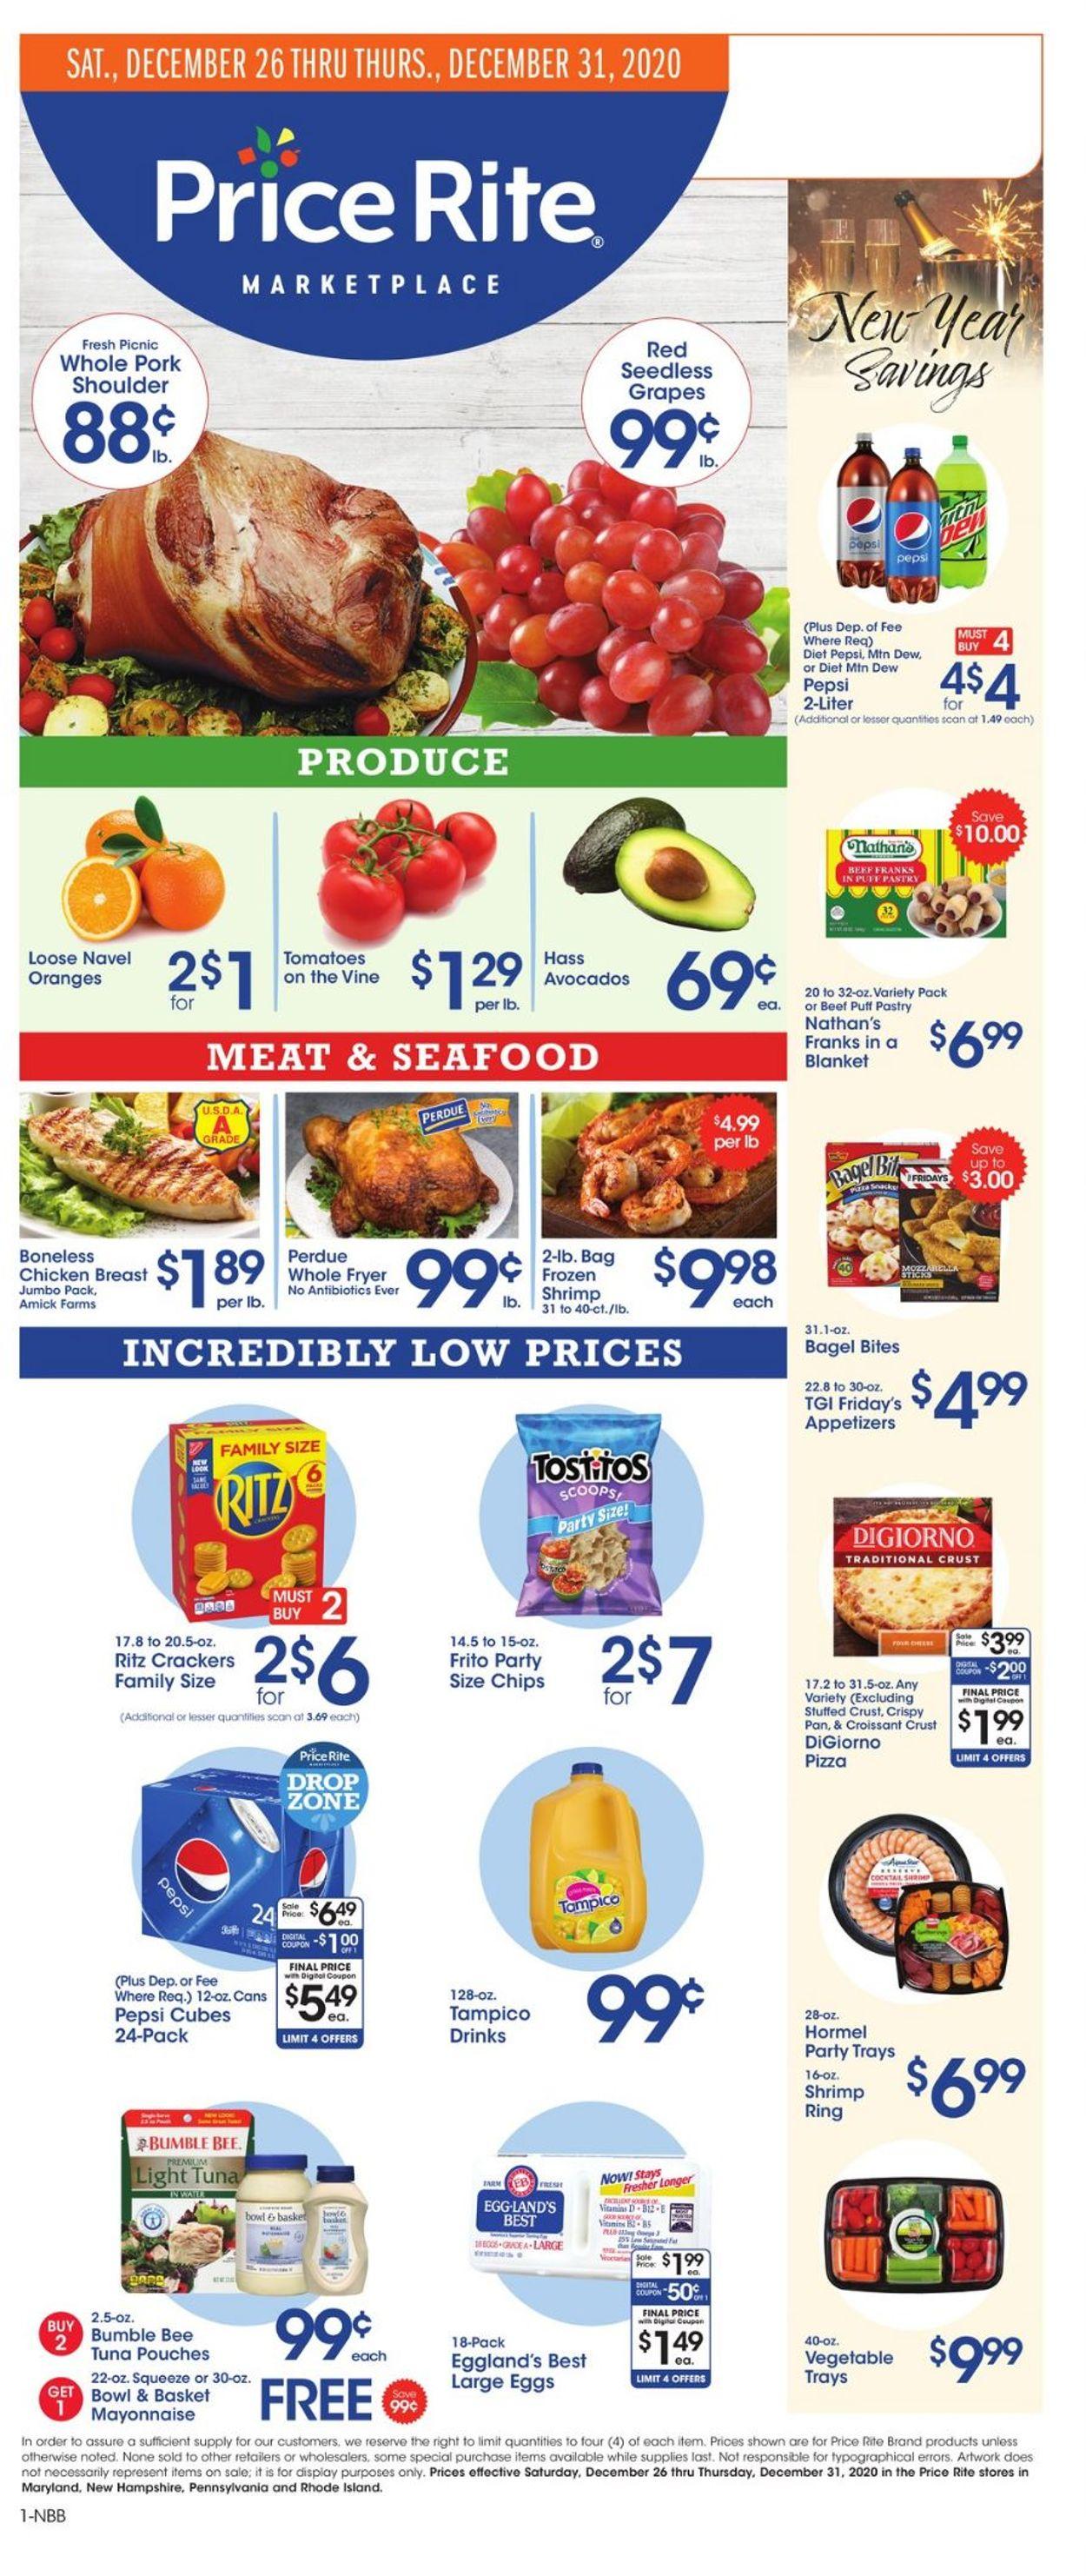 Price Rite Weekly Ad Circular - valid 12/26-12/31/2020